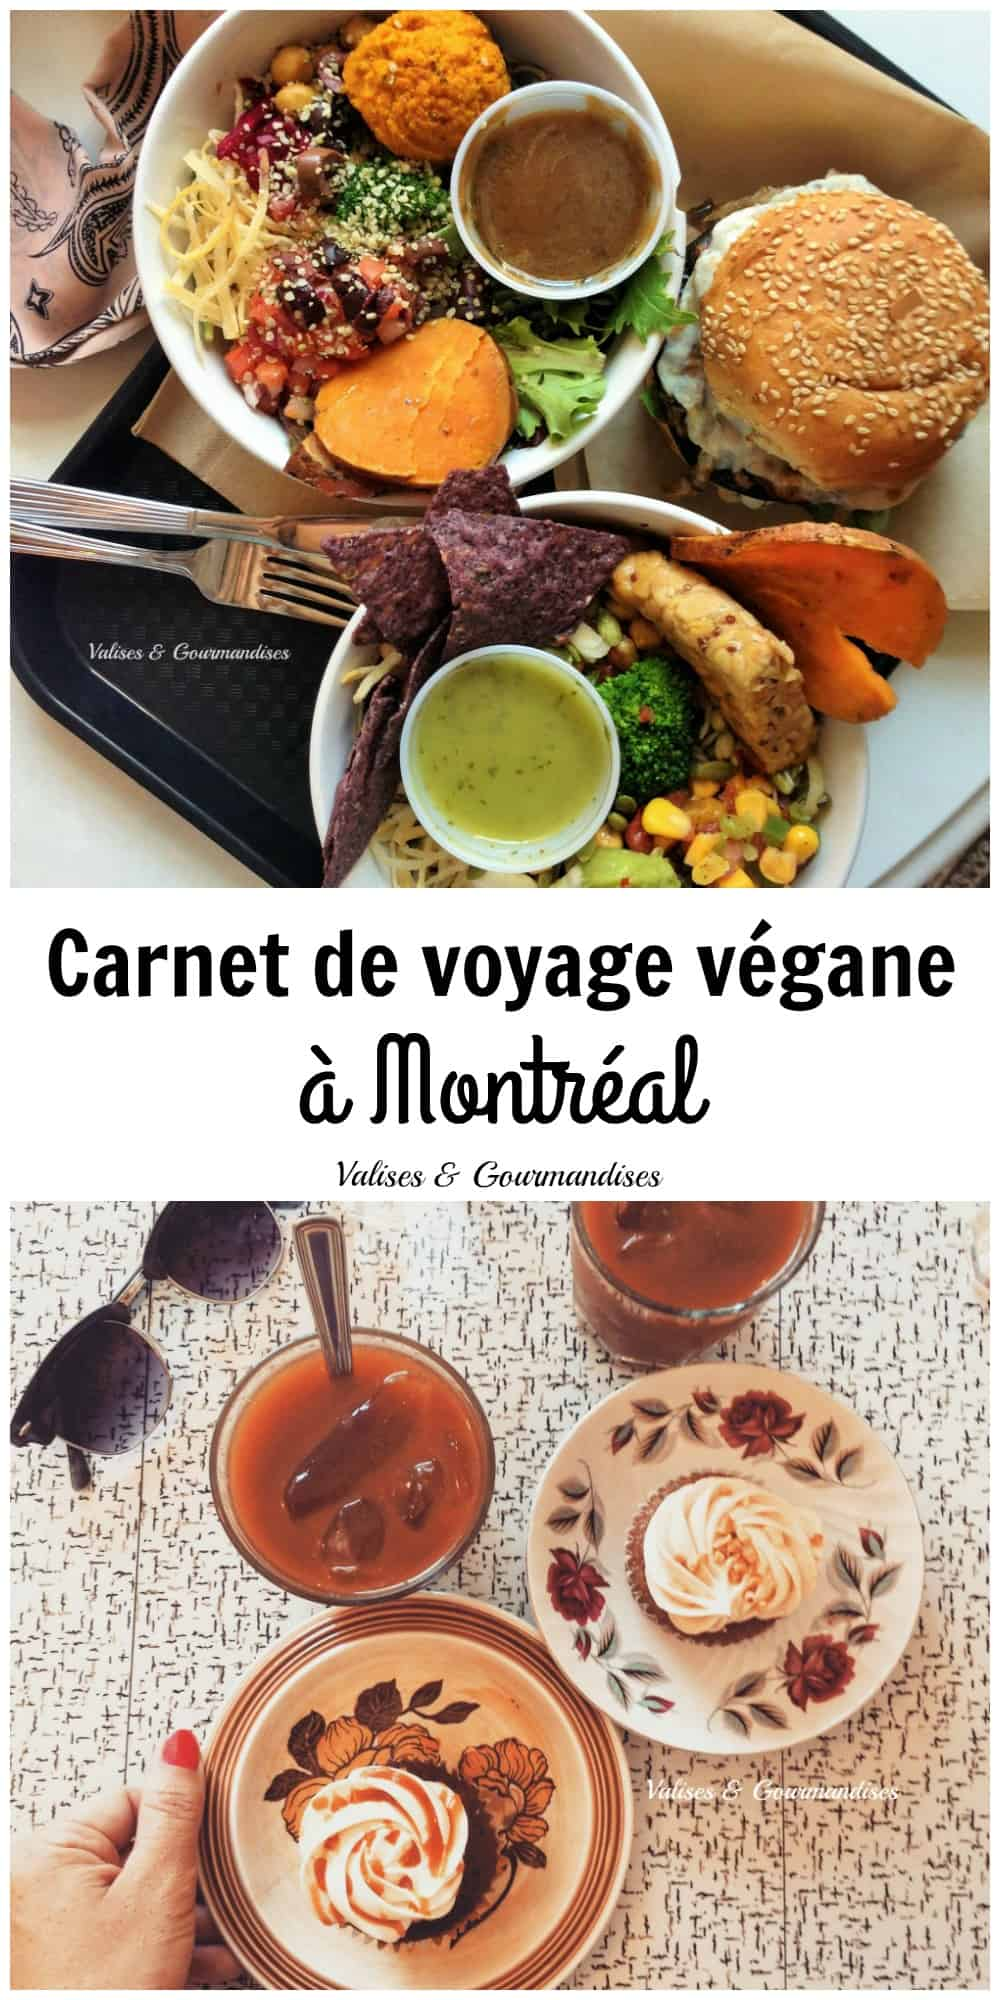 carnet-de-voyage-vegane-a-montreal